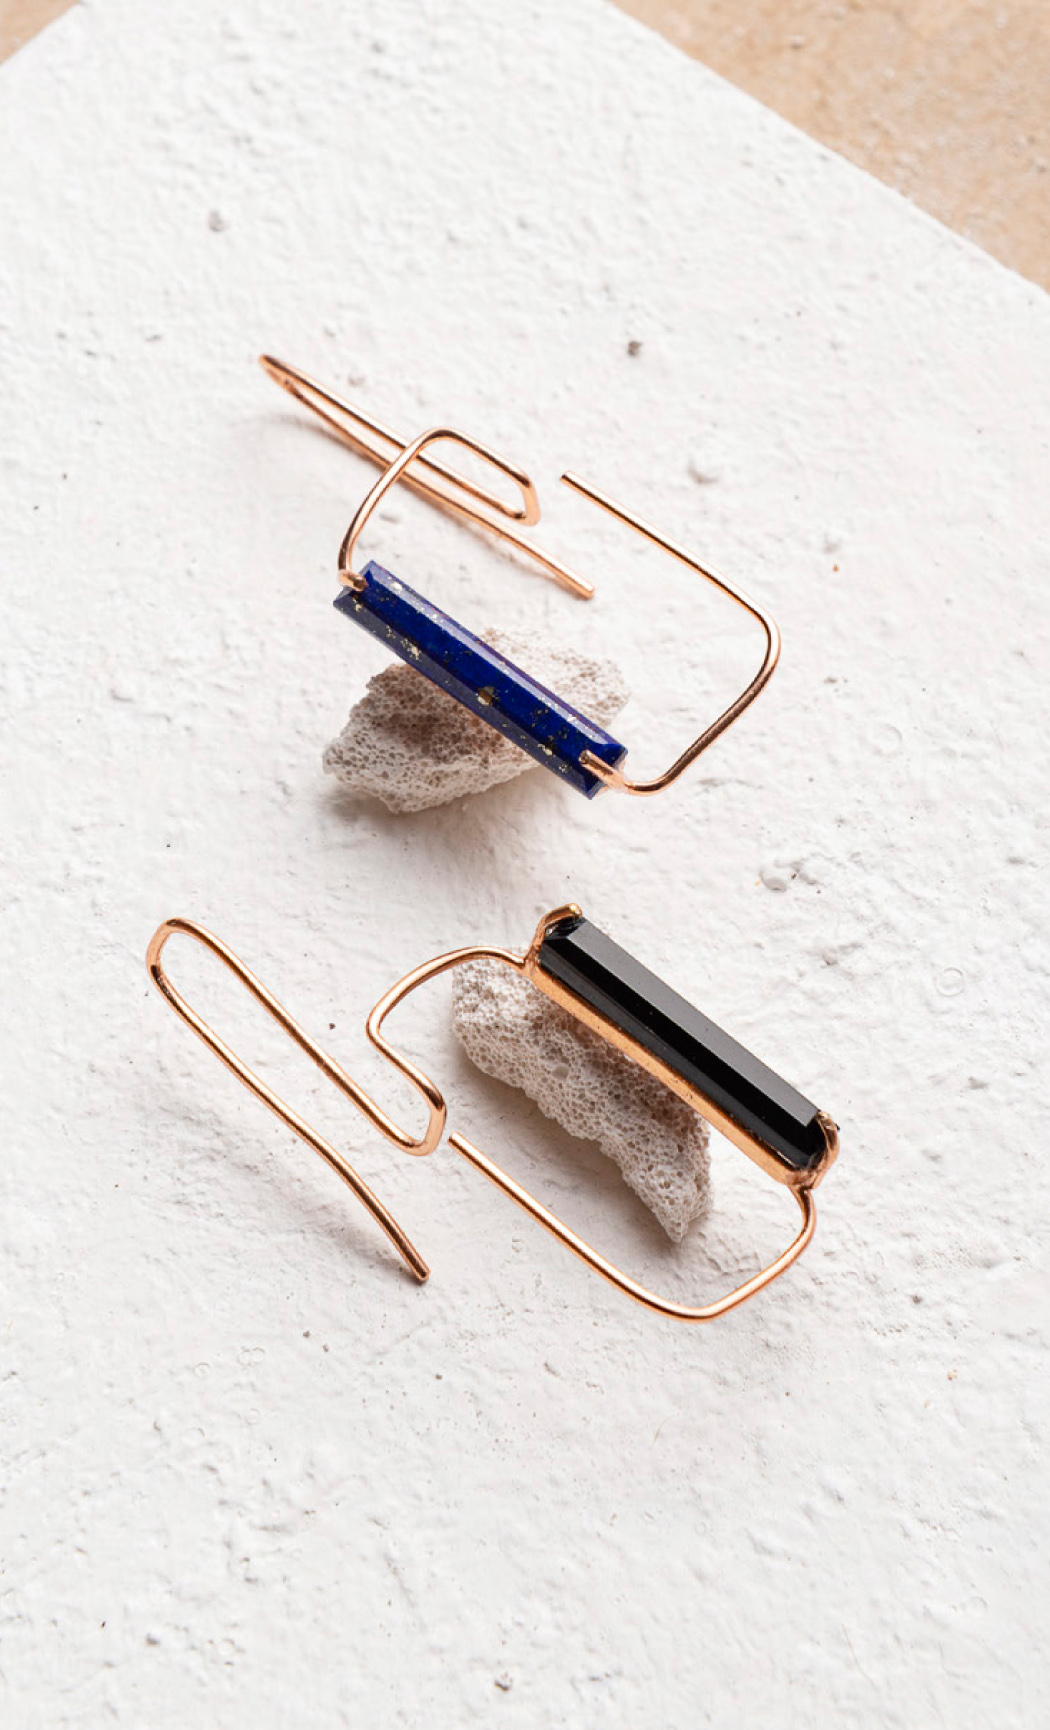 Black Onyx and Lapis Duo Rectangular Earrings - Buy Now.